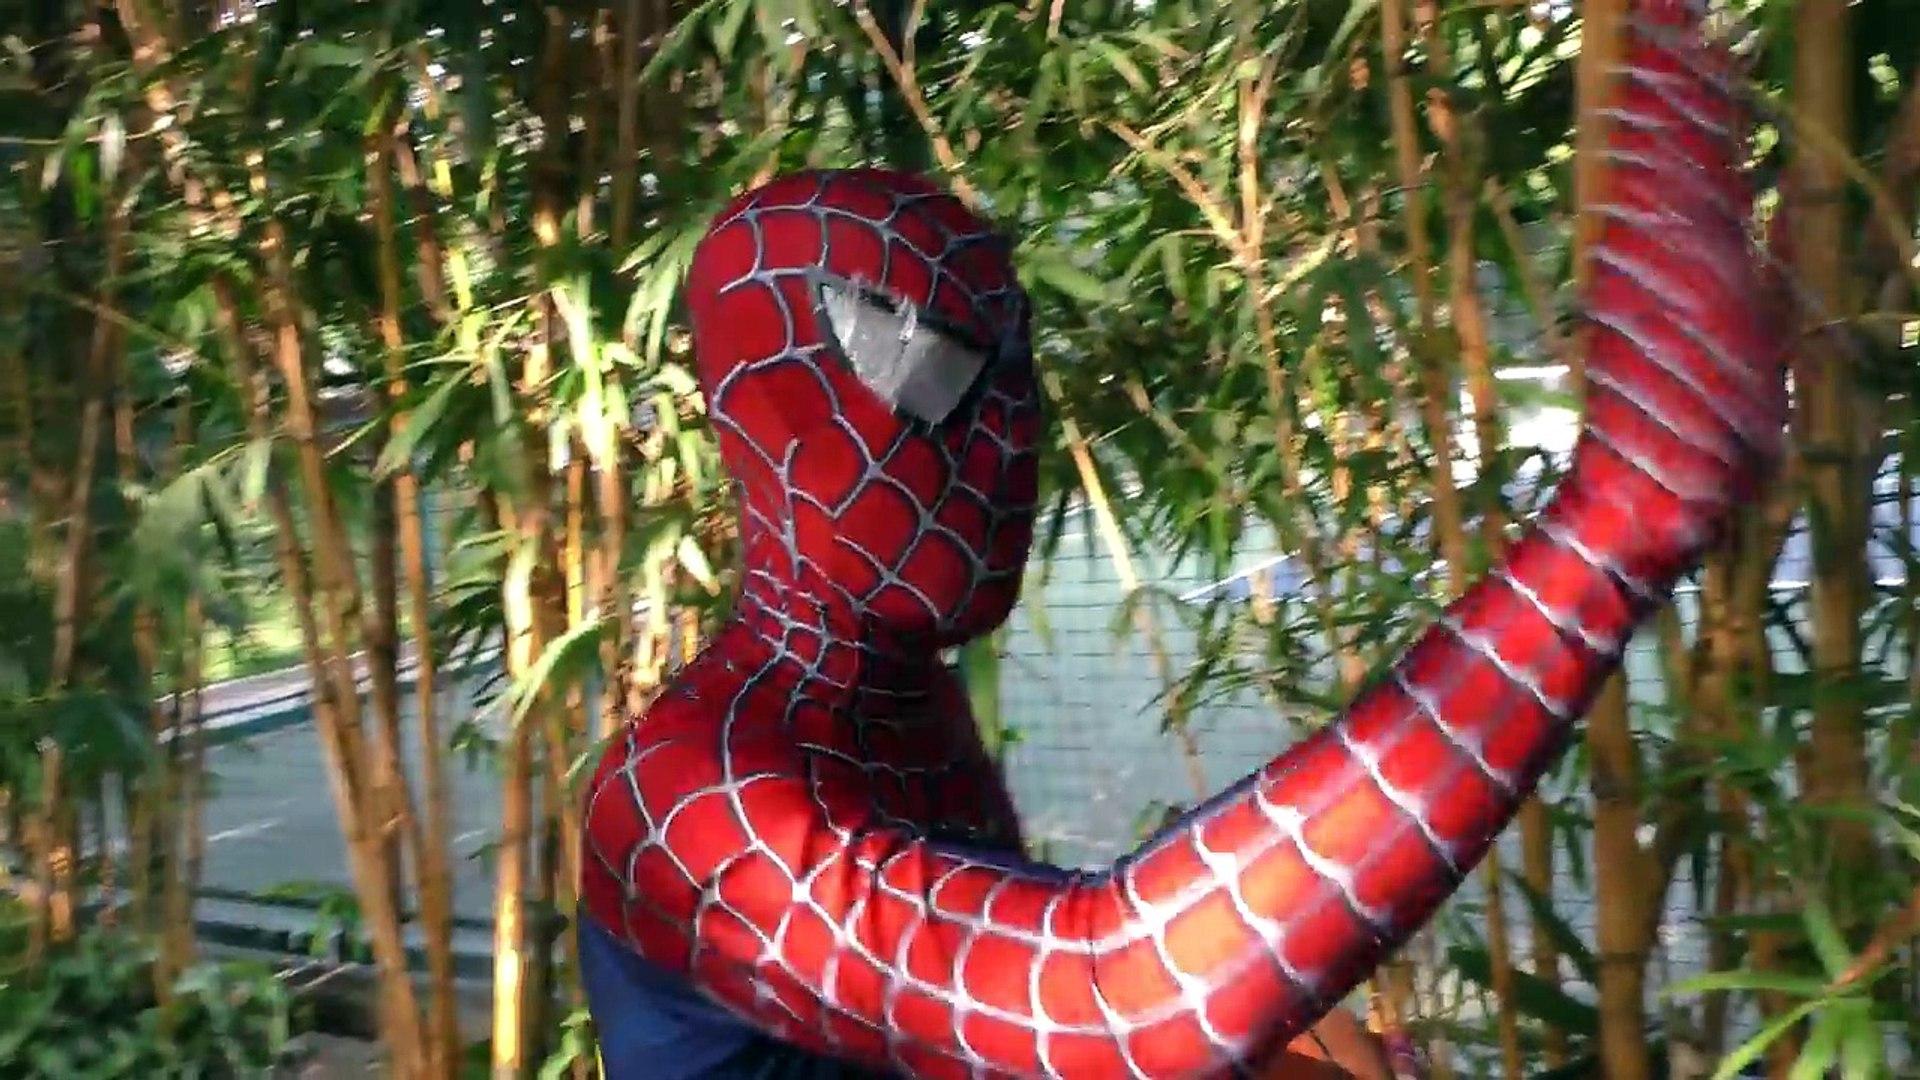 Spiderman Turn Were Wolf! Superheroes Monster Joker Venom Hulk Muscle Action Movies Wolf S